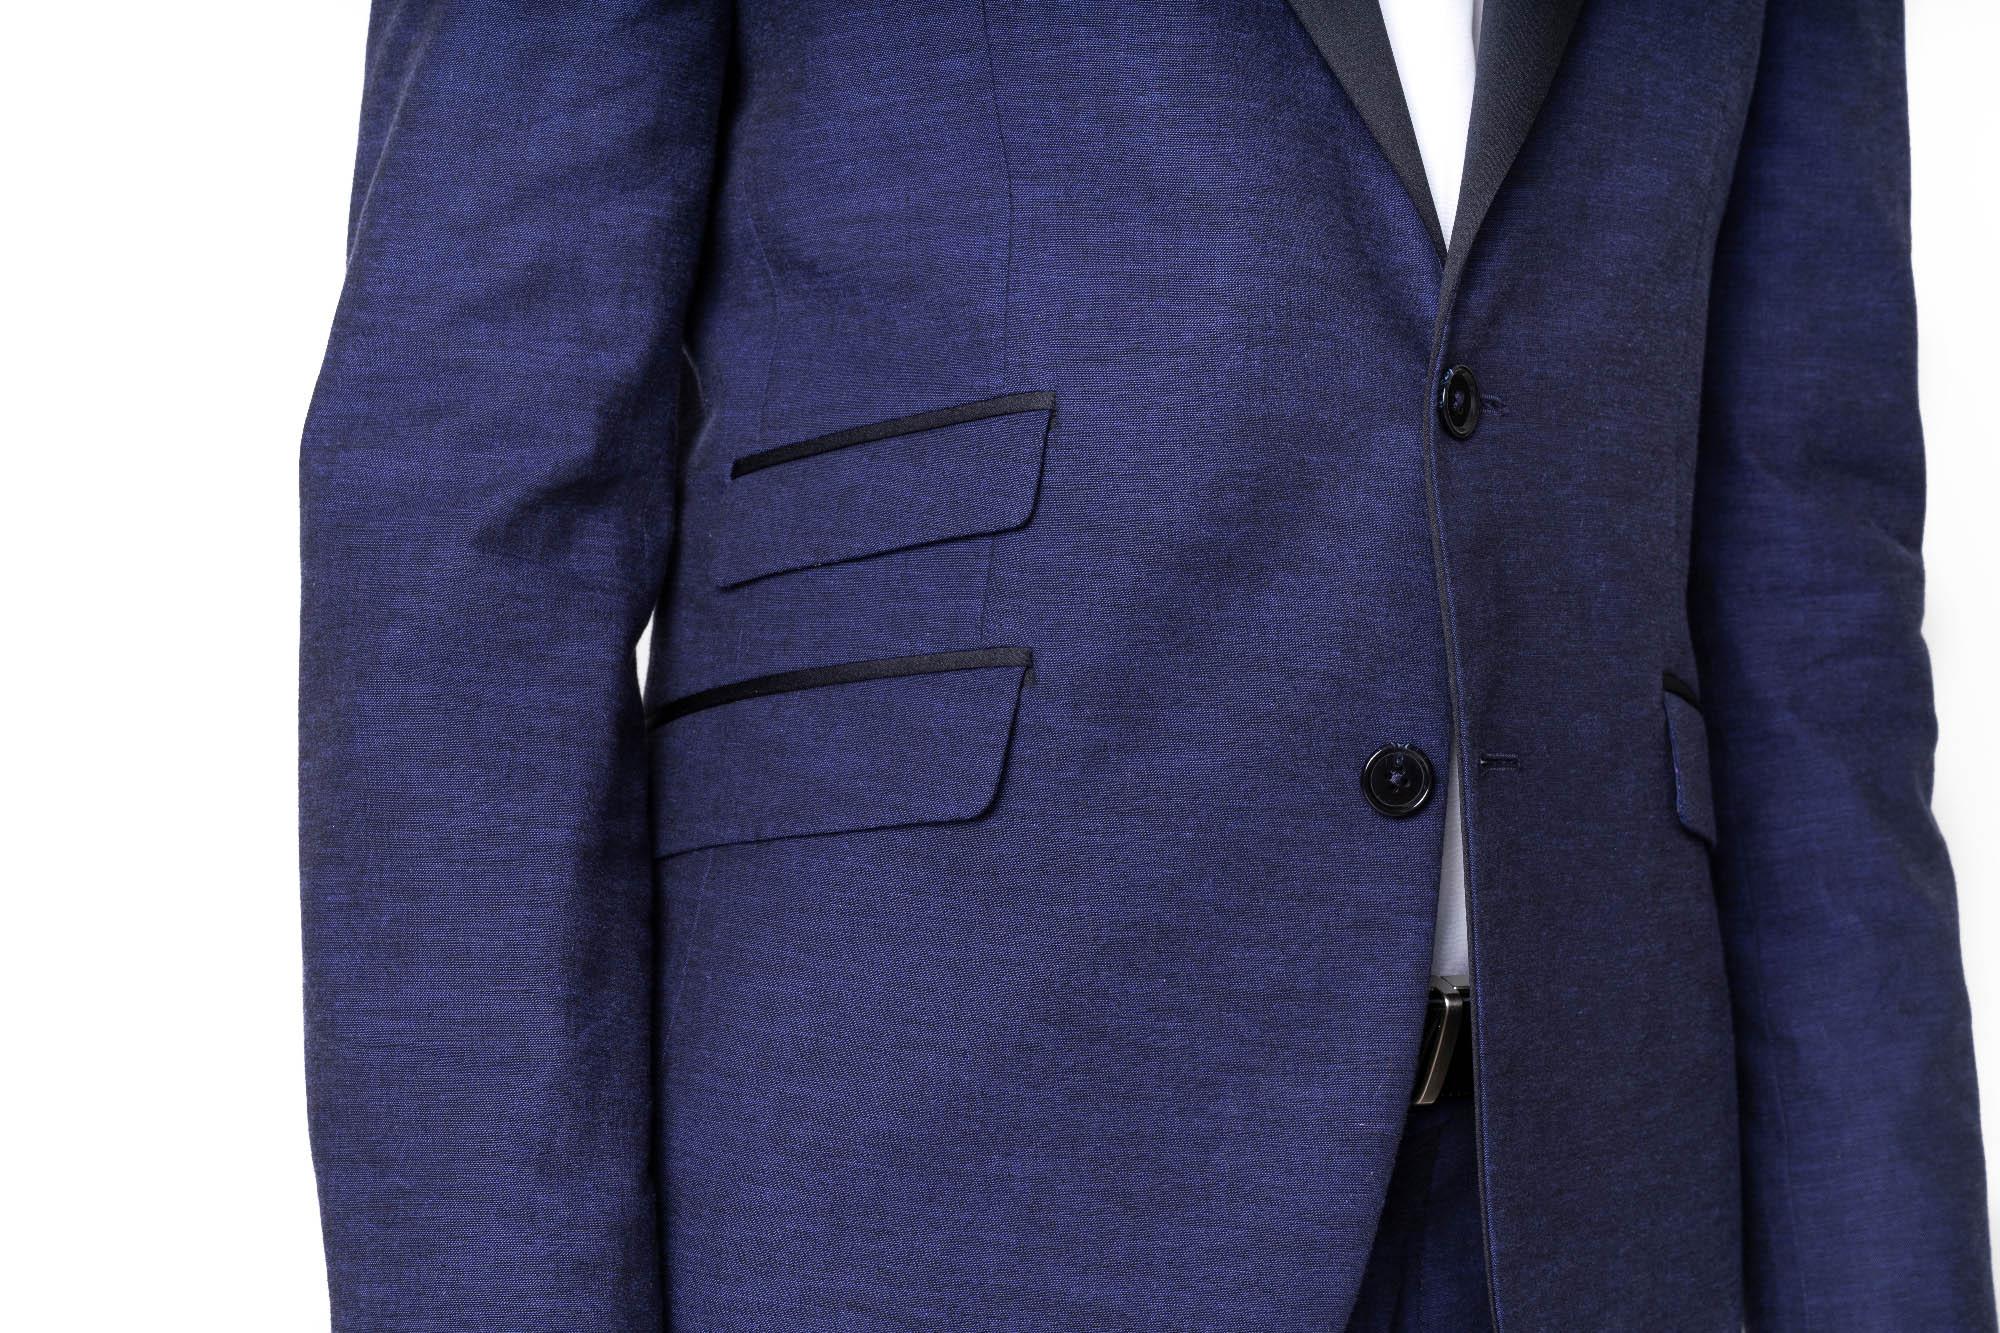 GarciaMadrid-traje-azul-lino-sastrería.jpg